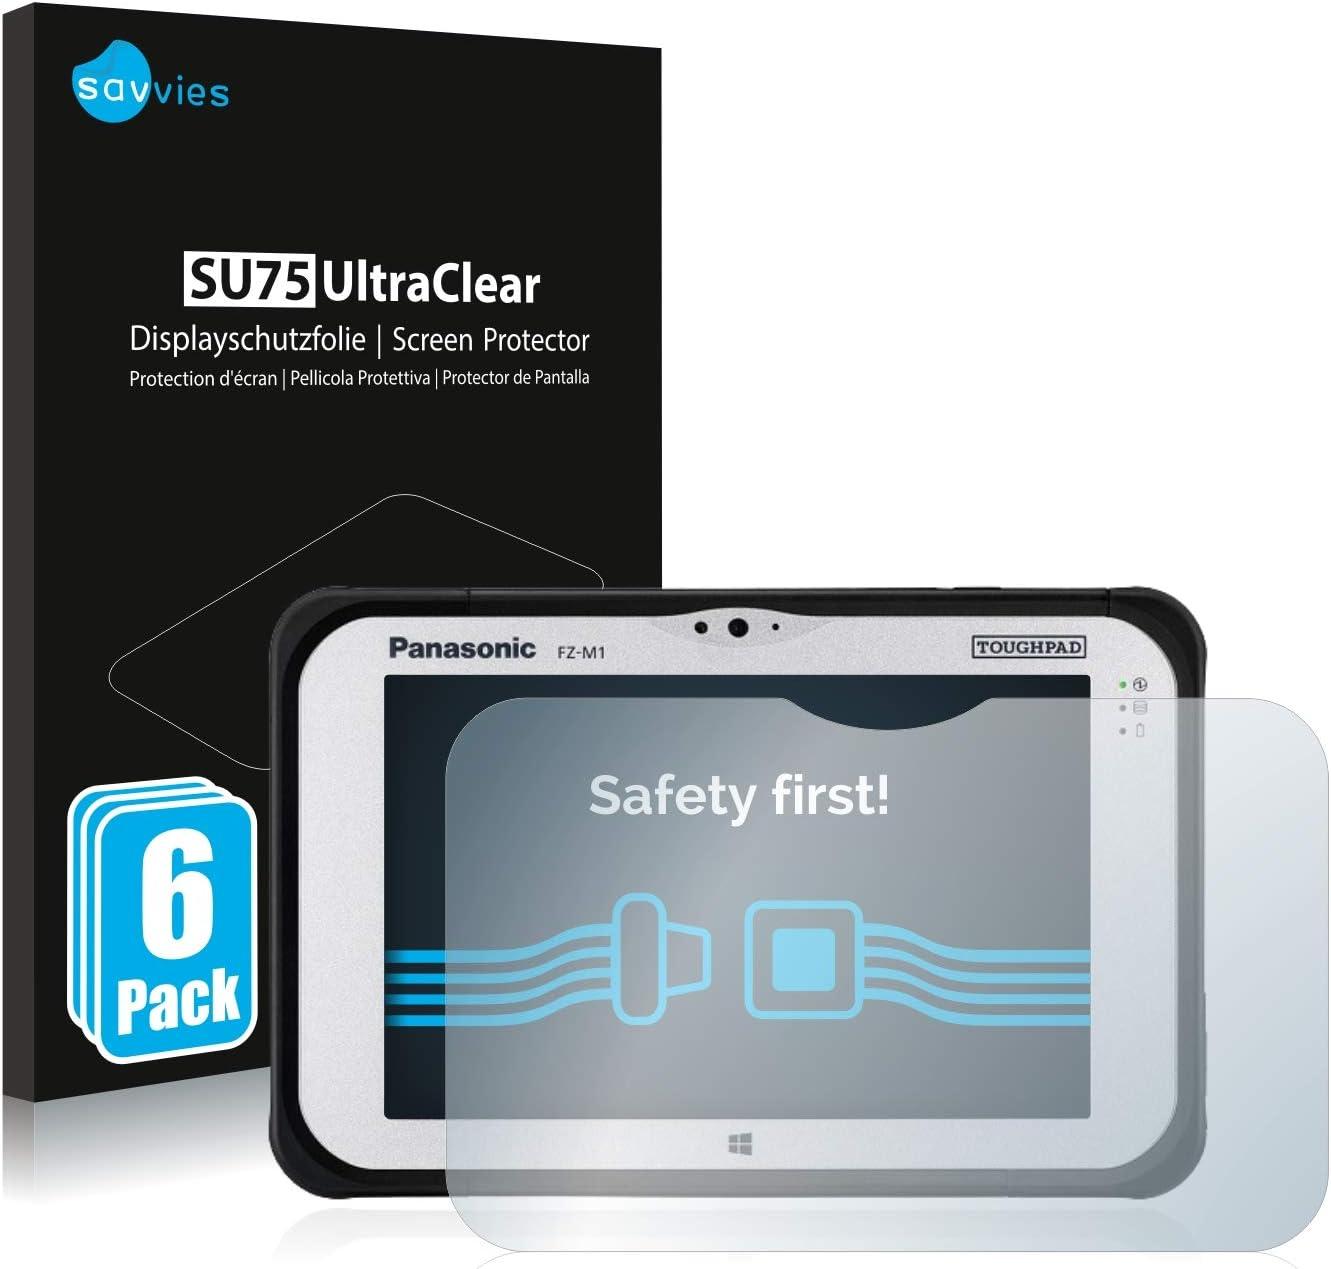 atFoliX Protection d/écran Compatible avec Panasonic ToughPad FZ-A1 Miroir Film Protecteur Effet Miroir FX Miroir Protection d/écran